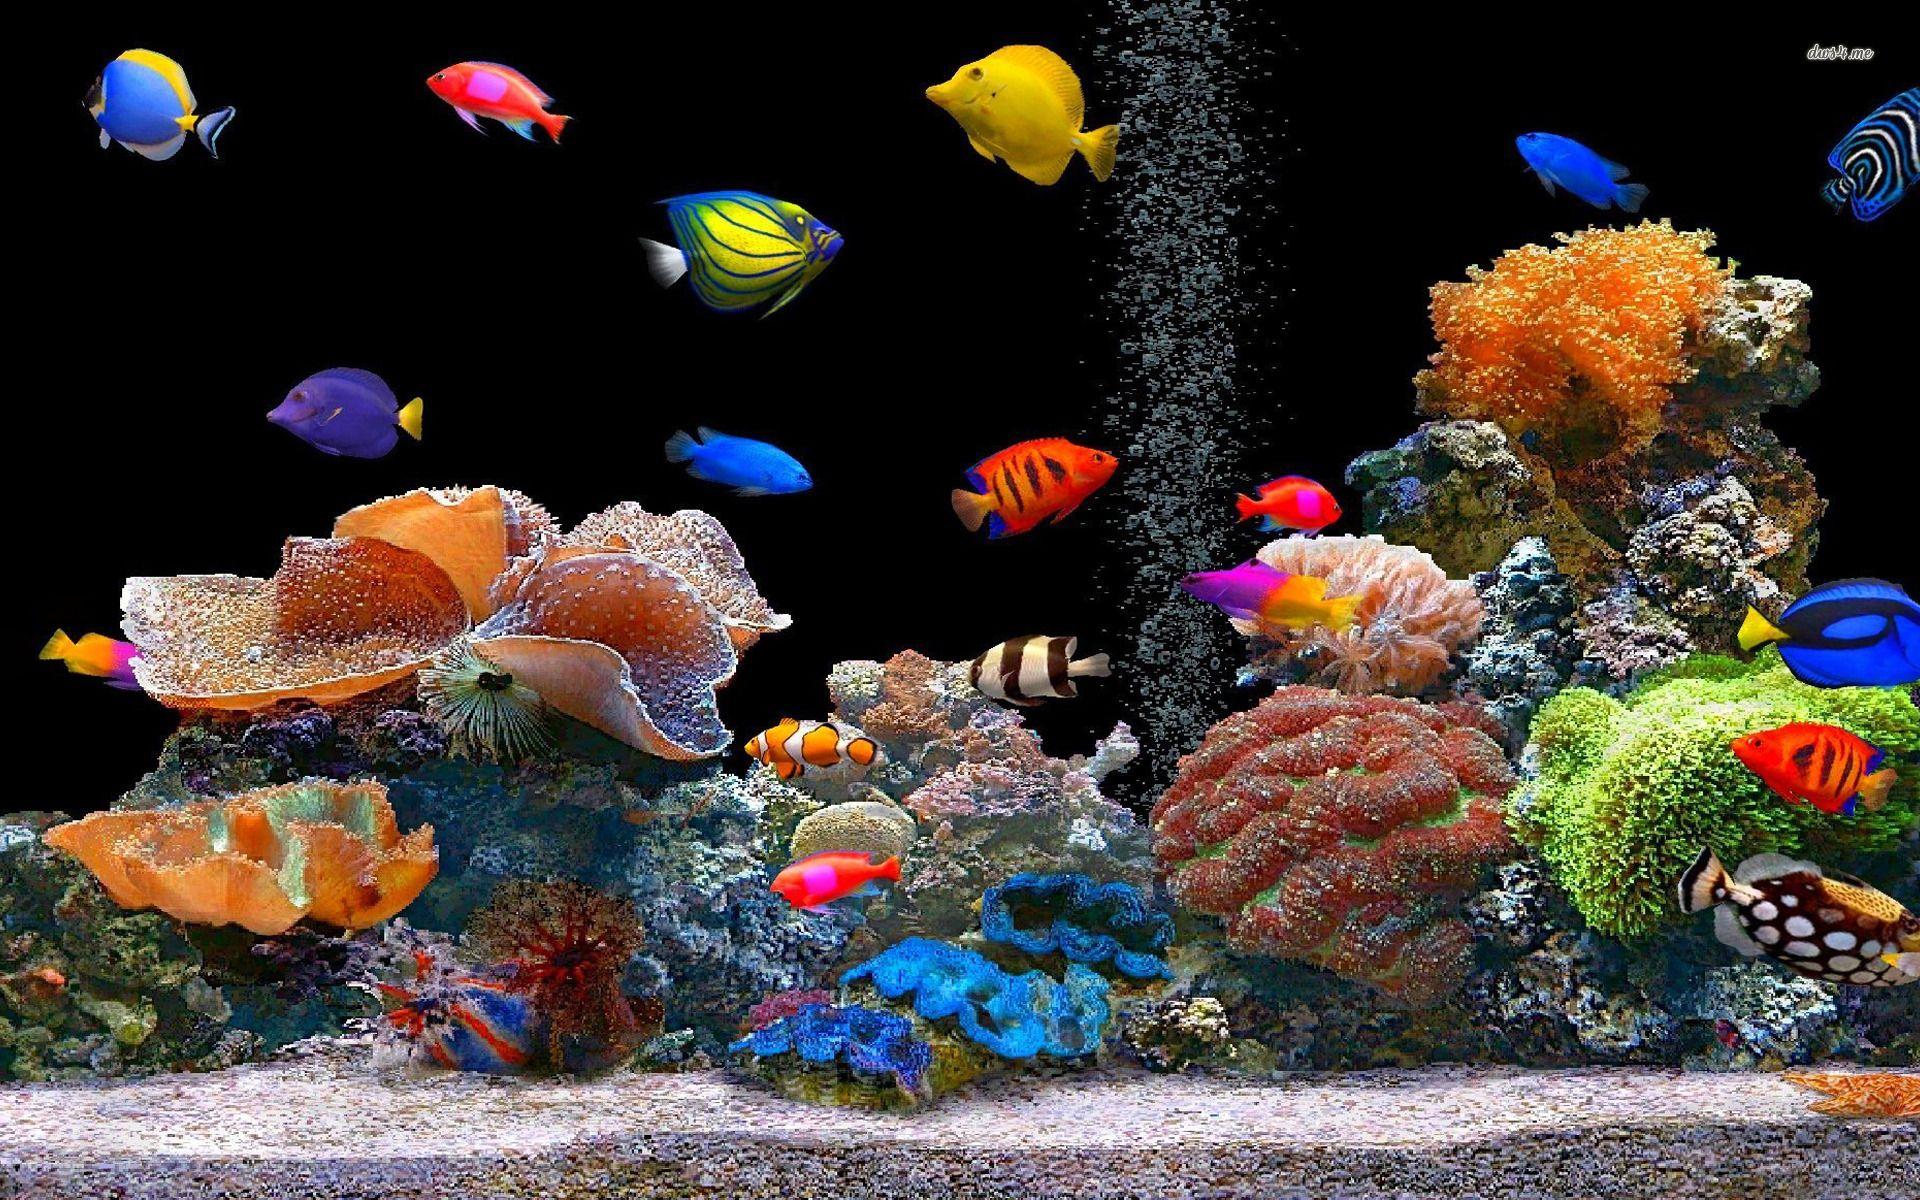 Peces de colores hd wallpaper gratis fondo de pantallas for Pagina de wallpapers hd